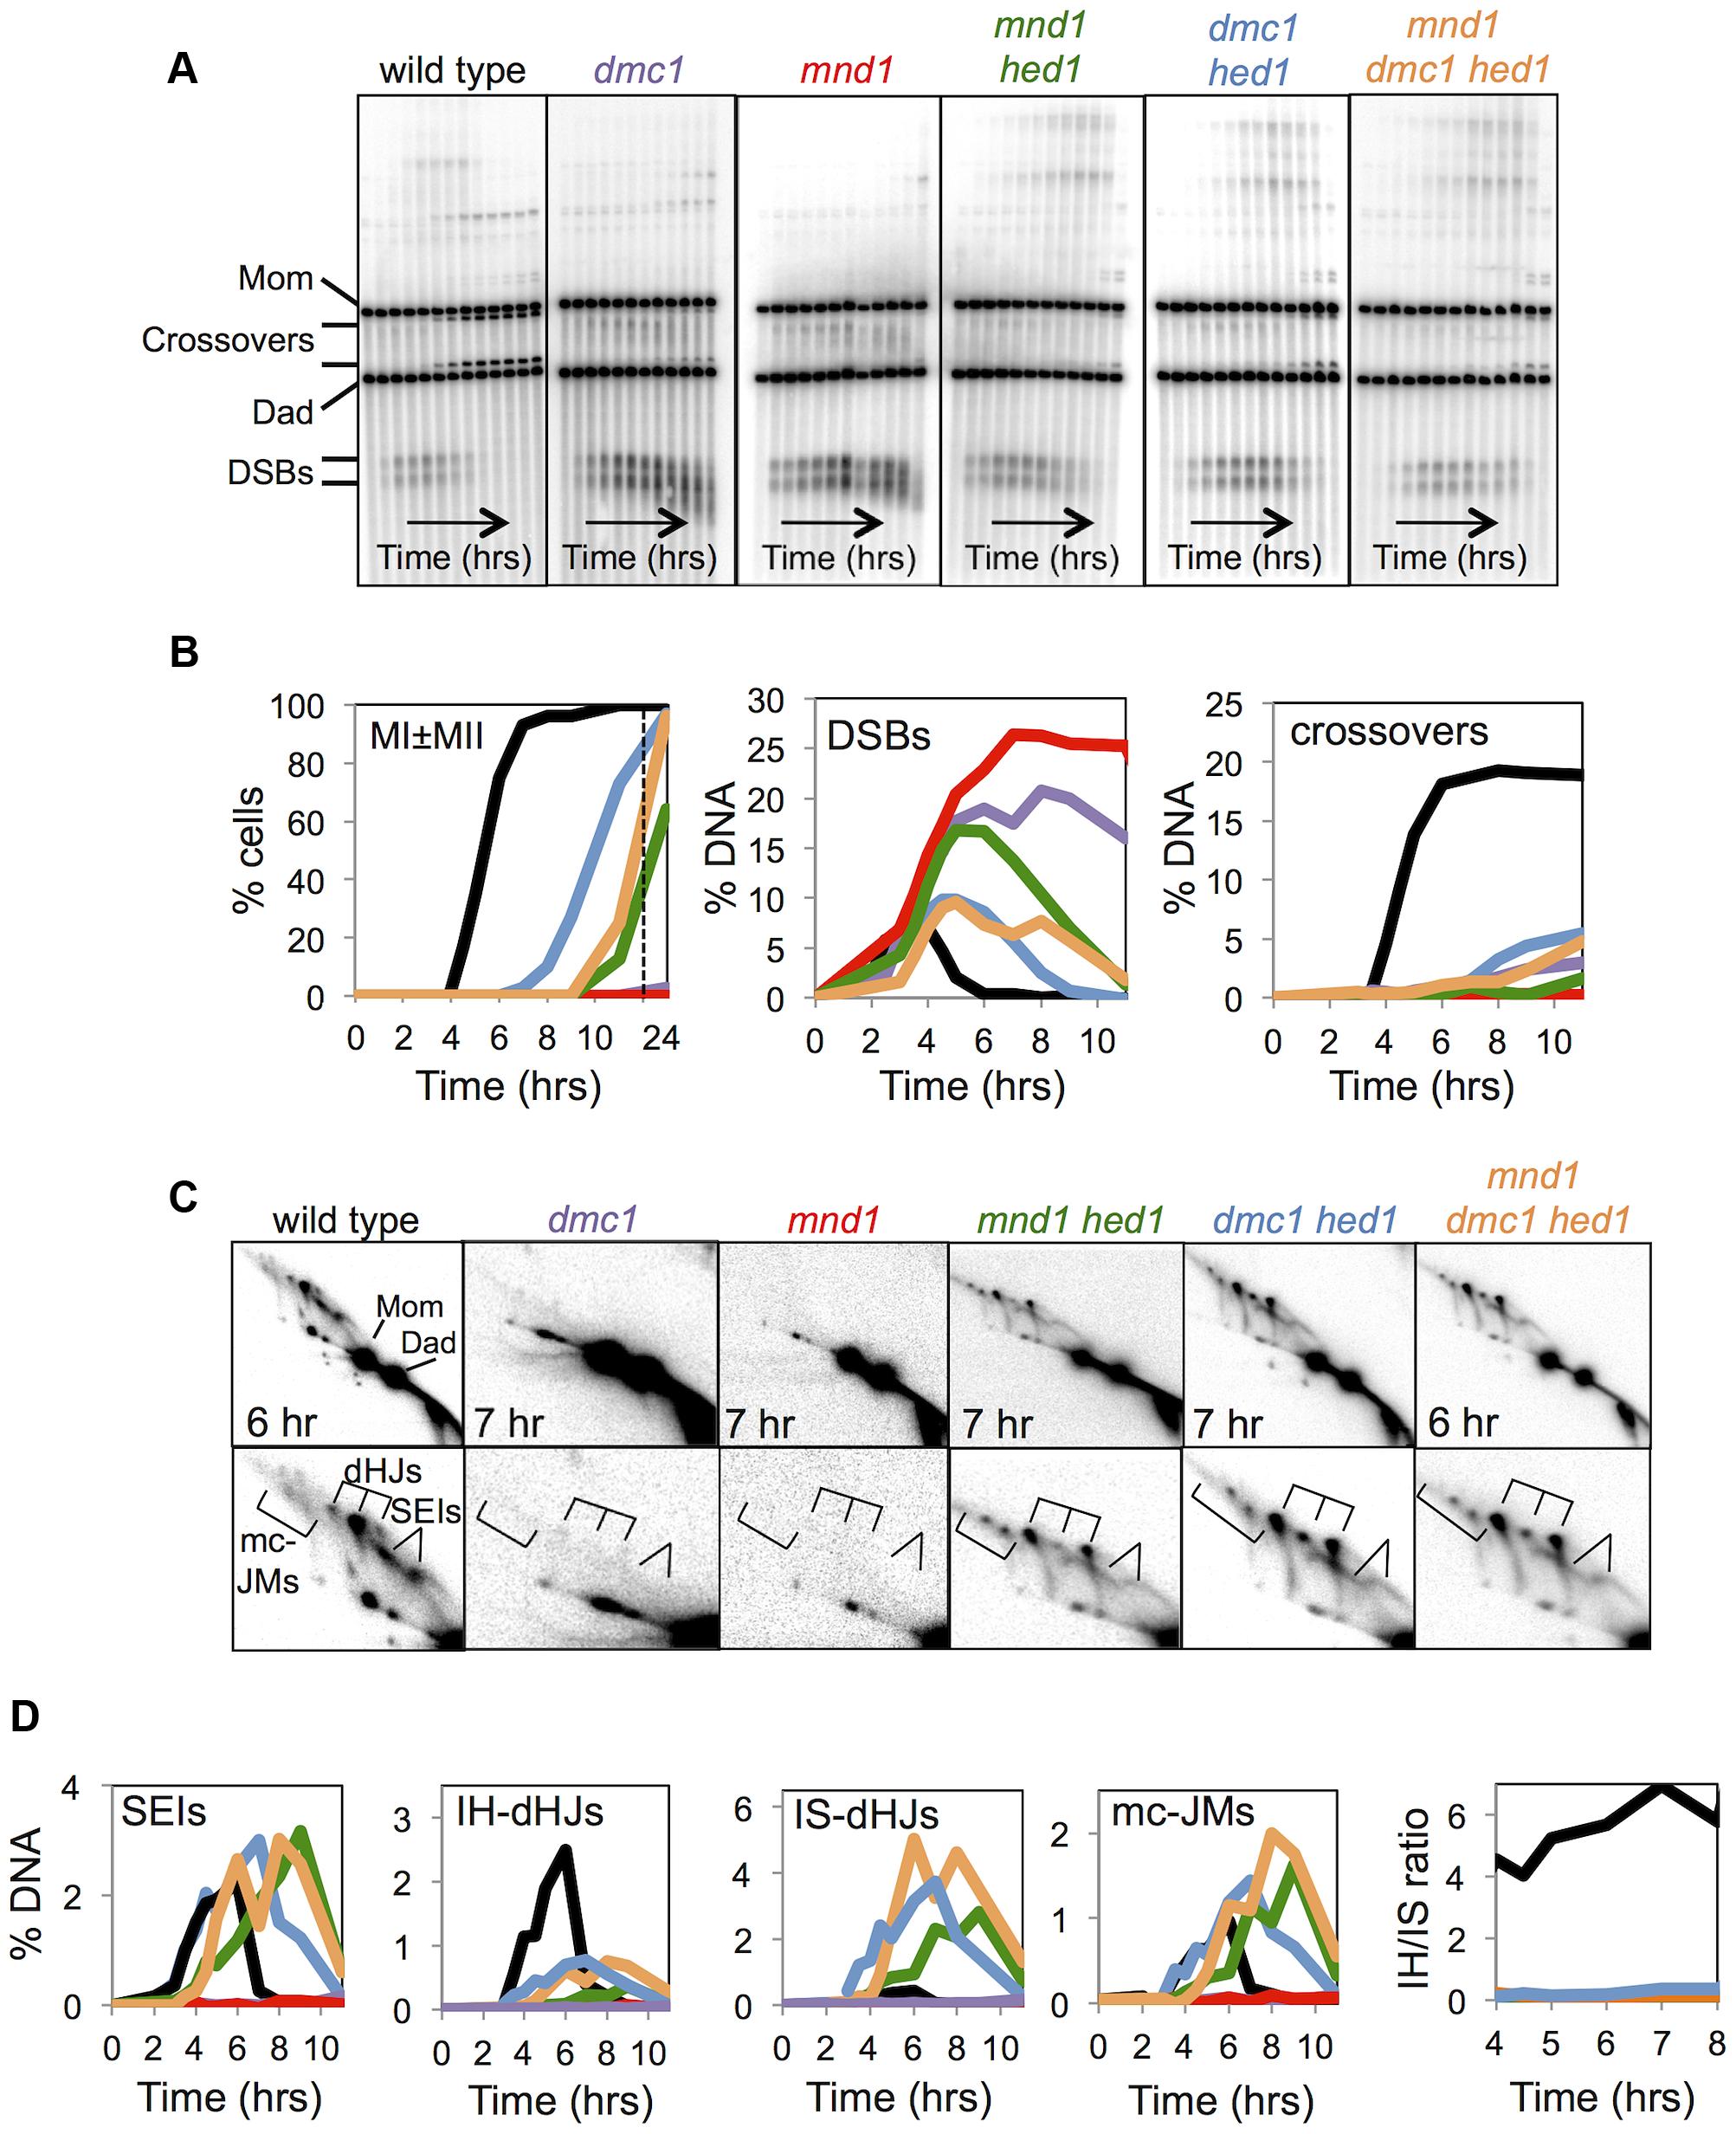 Mnd1 promotes Dmc1-dependent interhomolog recombination and Dmc1 inhibits Rad51-mediated recombination.